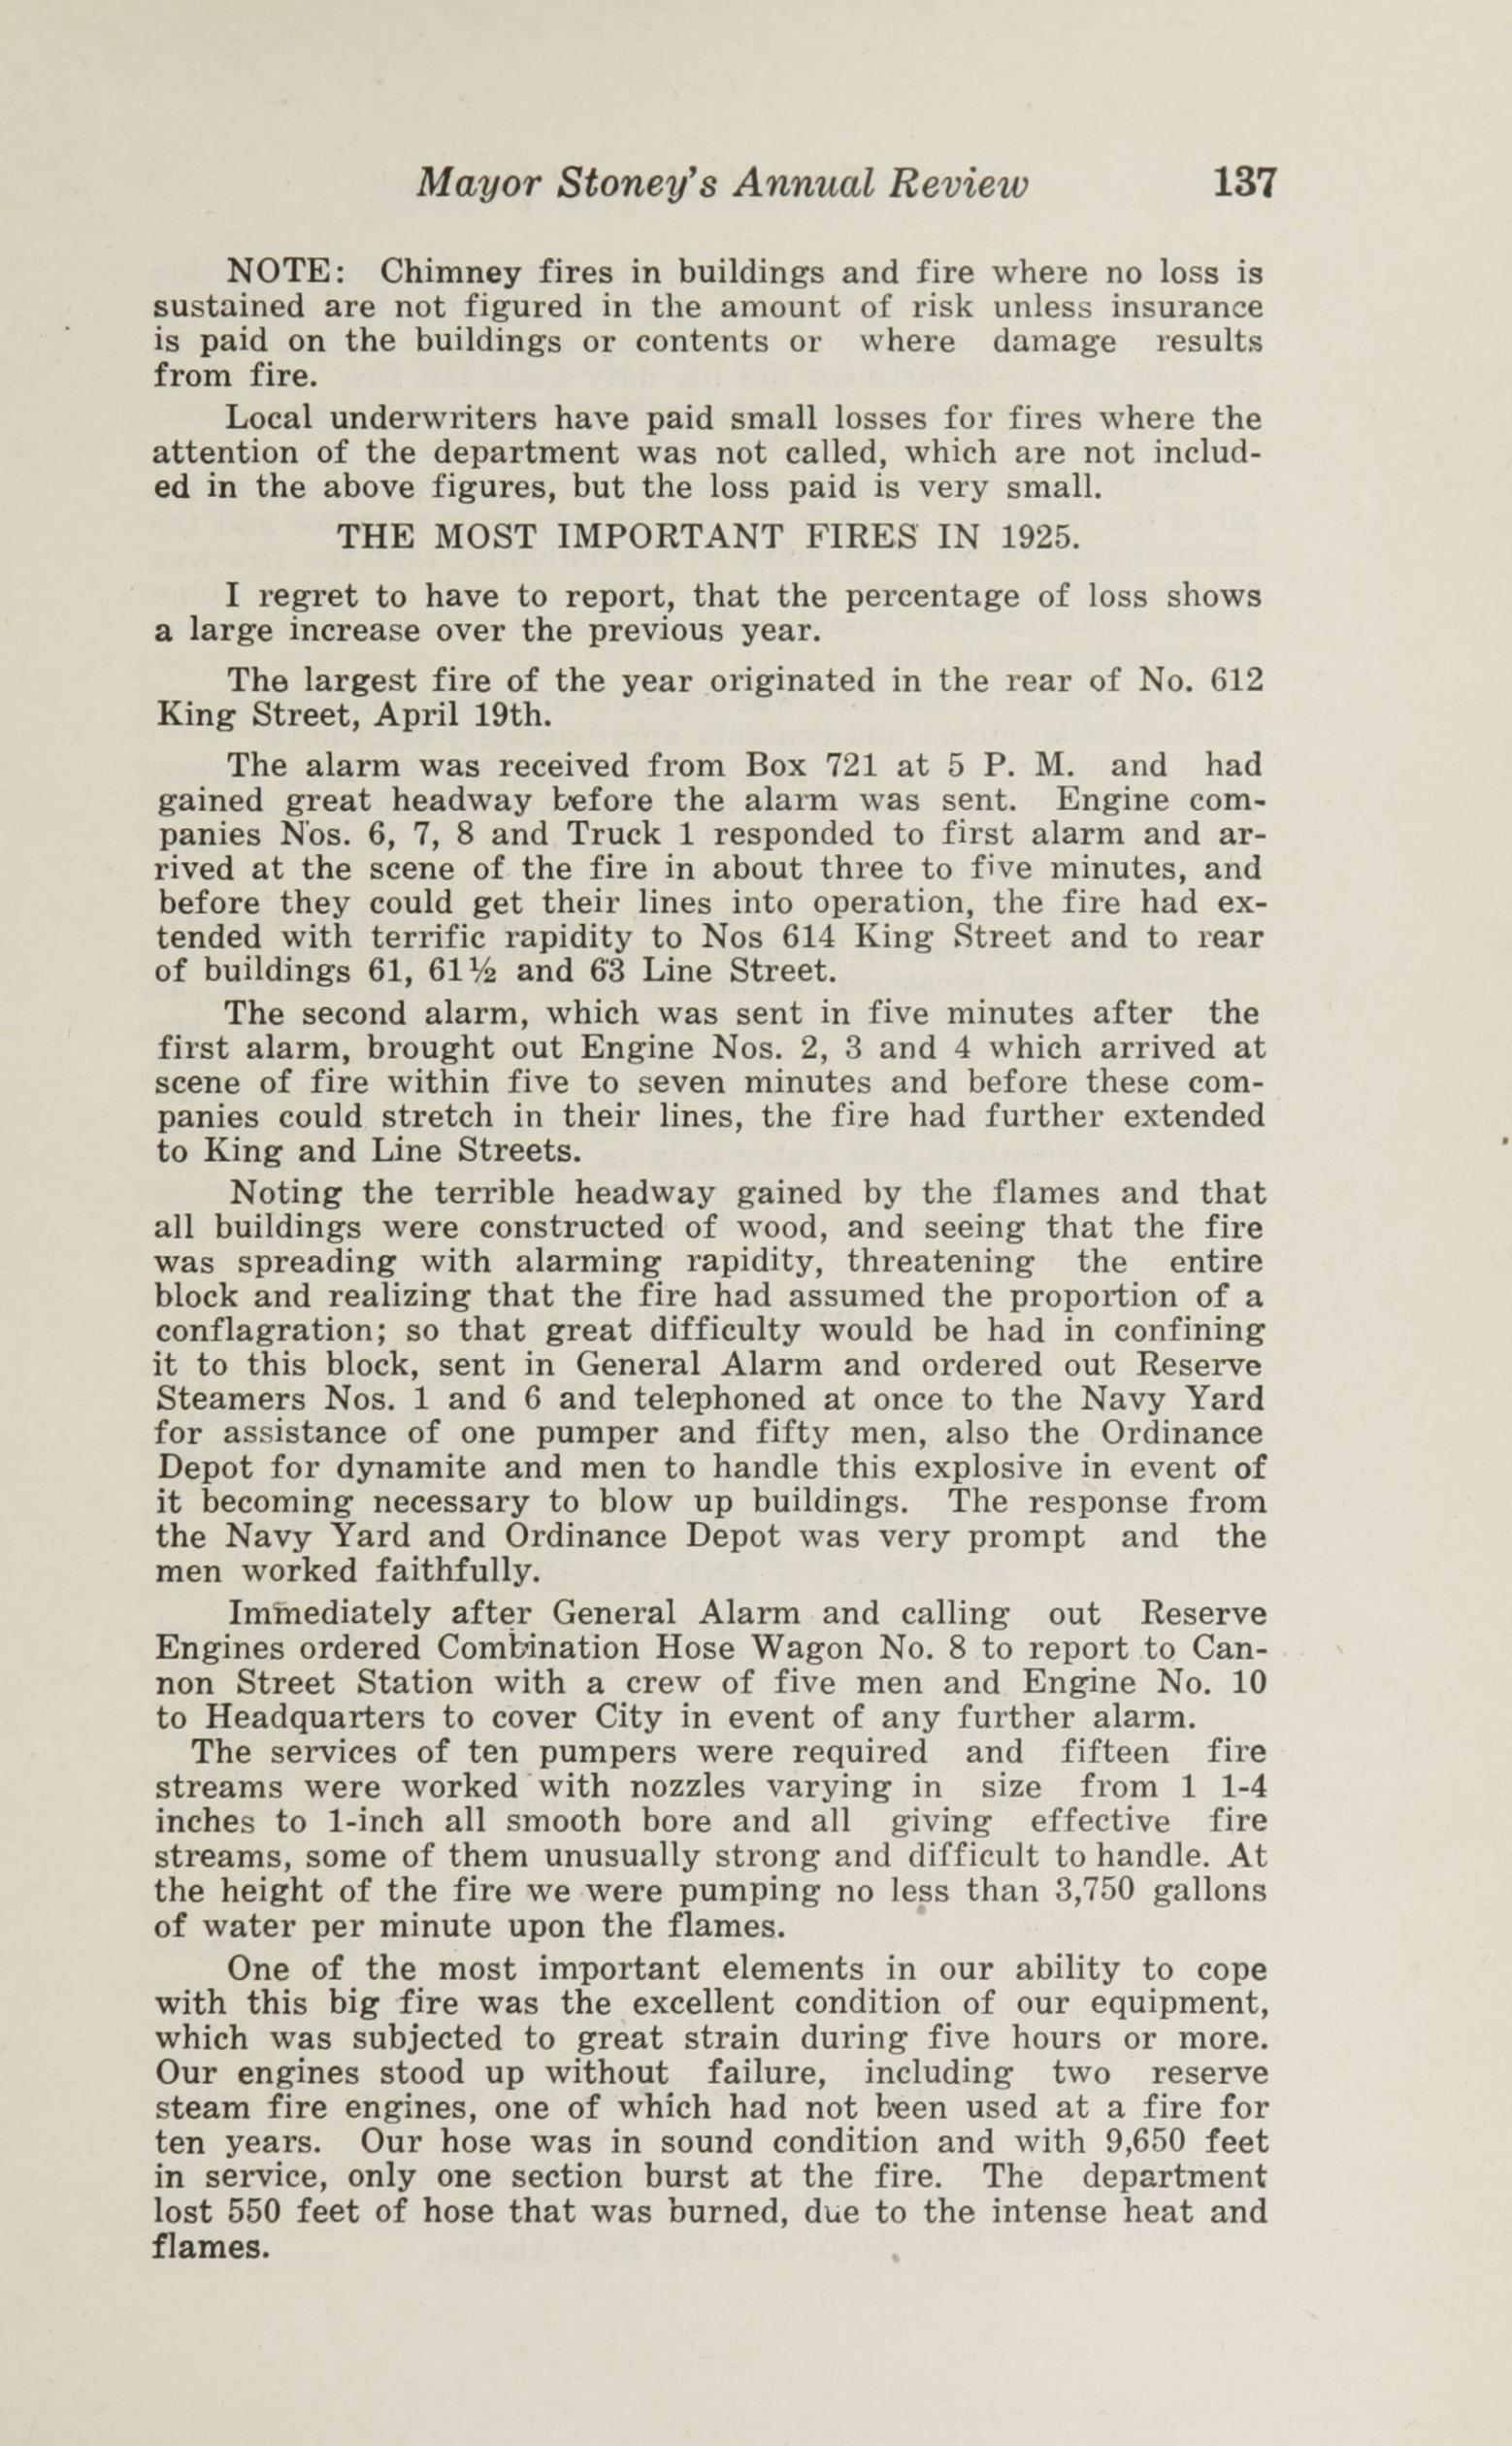 Charleston Yearbook, 1925, page 137